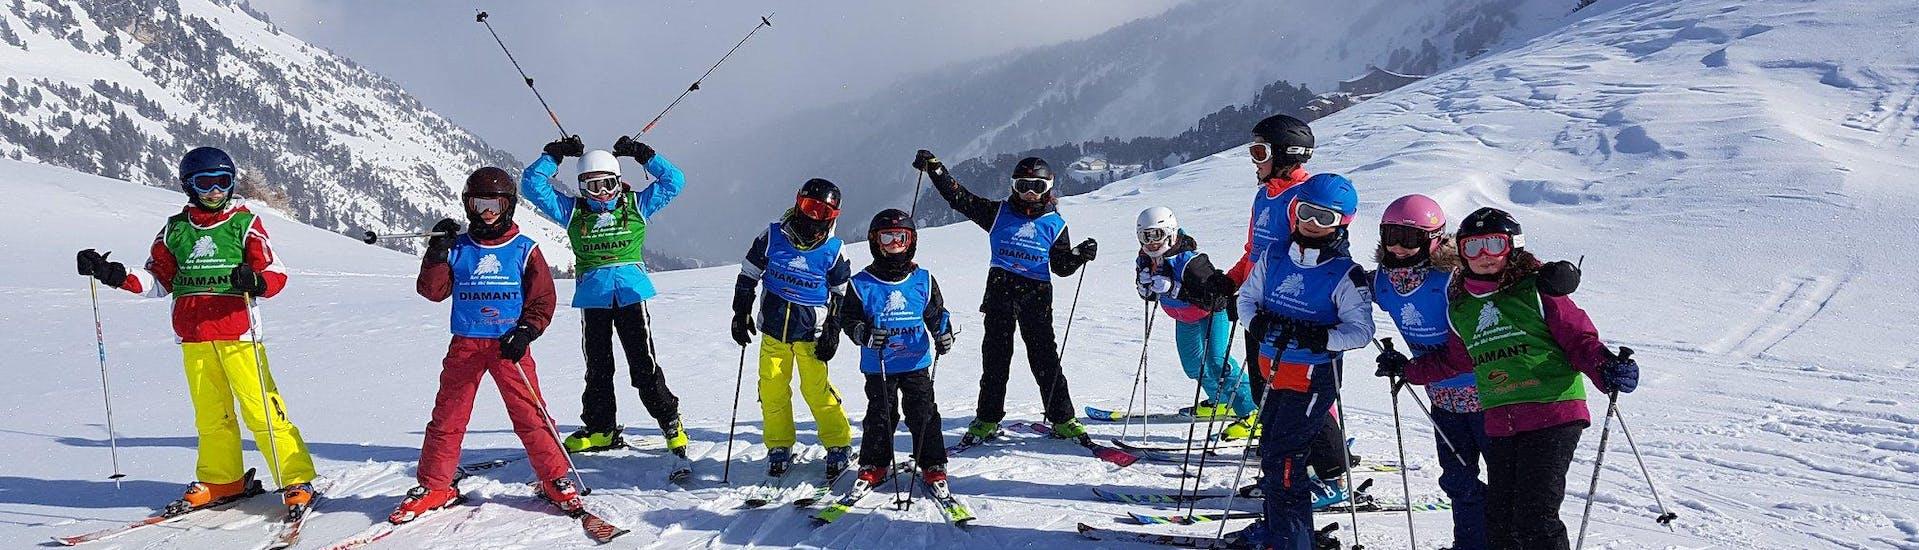 kids-ski-lessons-5-12-years-holiday-morning-esi-arc-aventures-hero